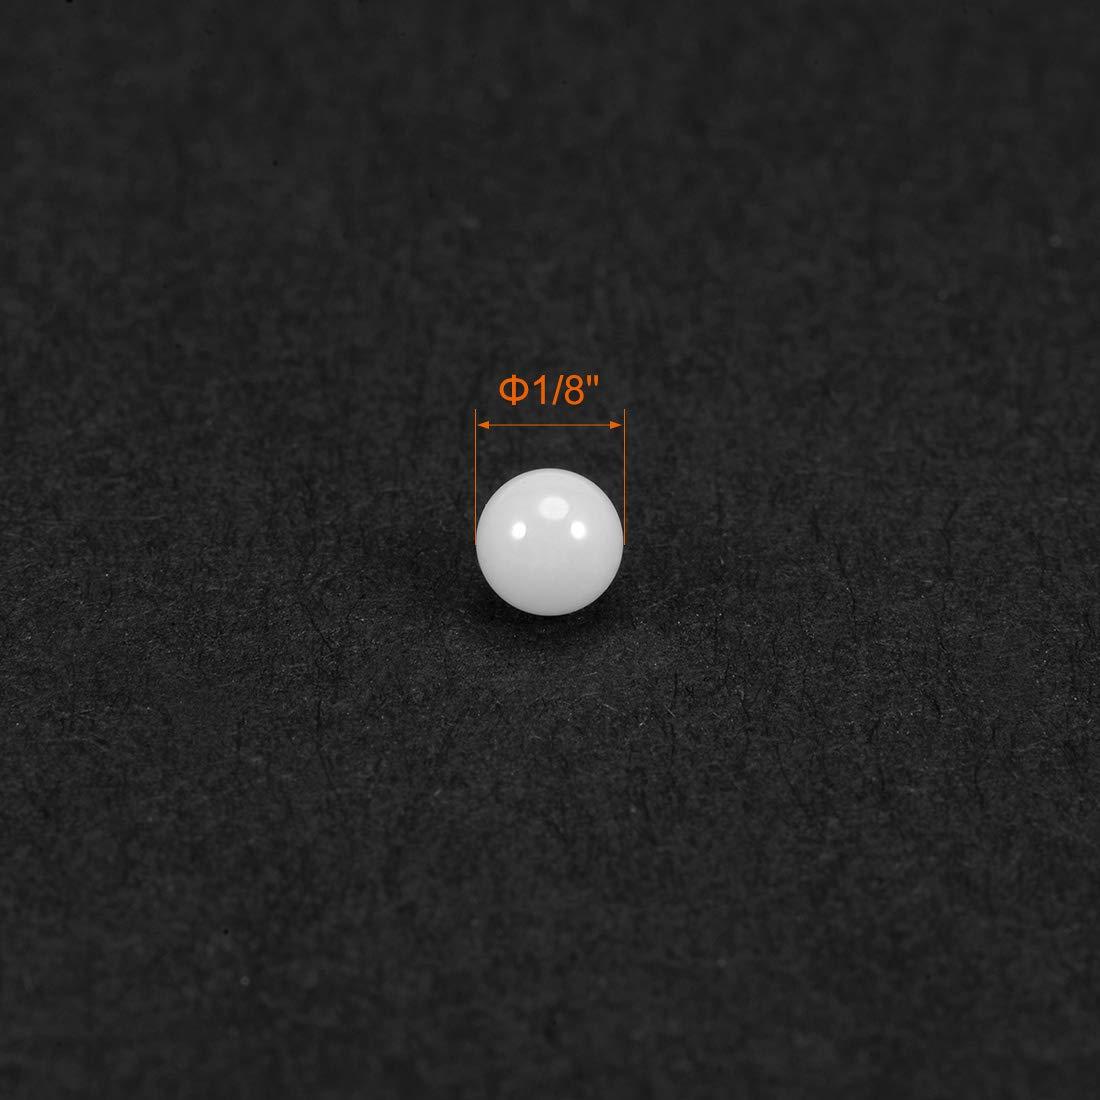 Sourcingmap 5 Qty Bolas de rodamiento de cer/ámica de 1//4 pulgadas bola de /óxido de circonio ZRO2 G10 precisi/ón 1//8